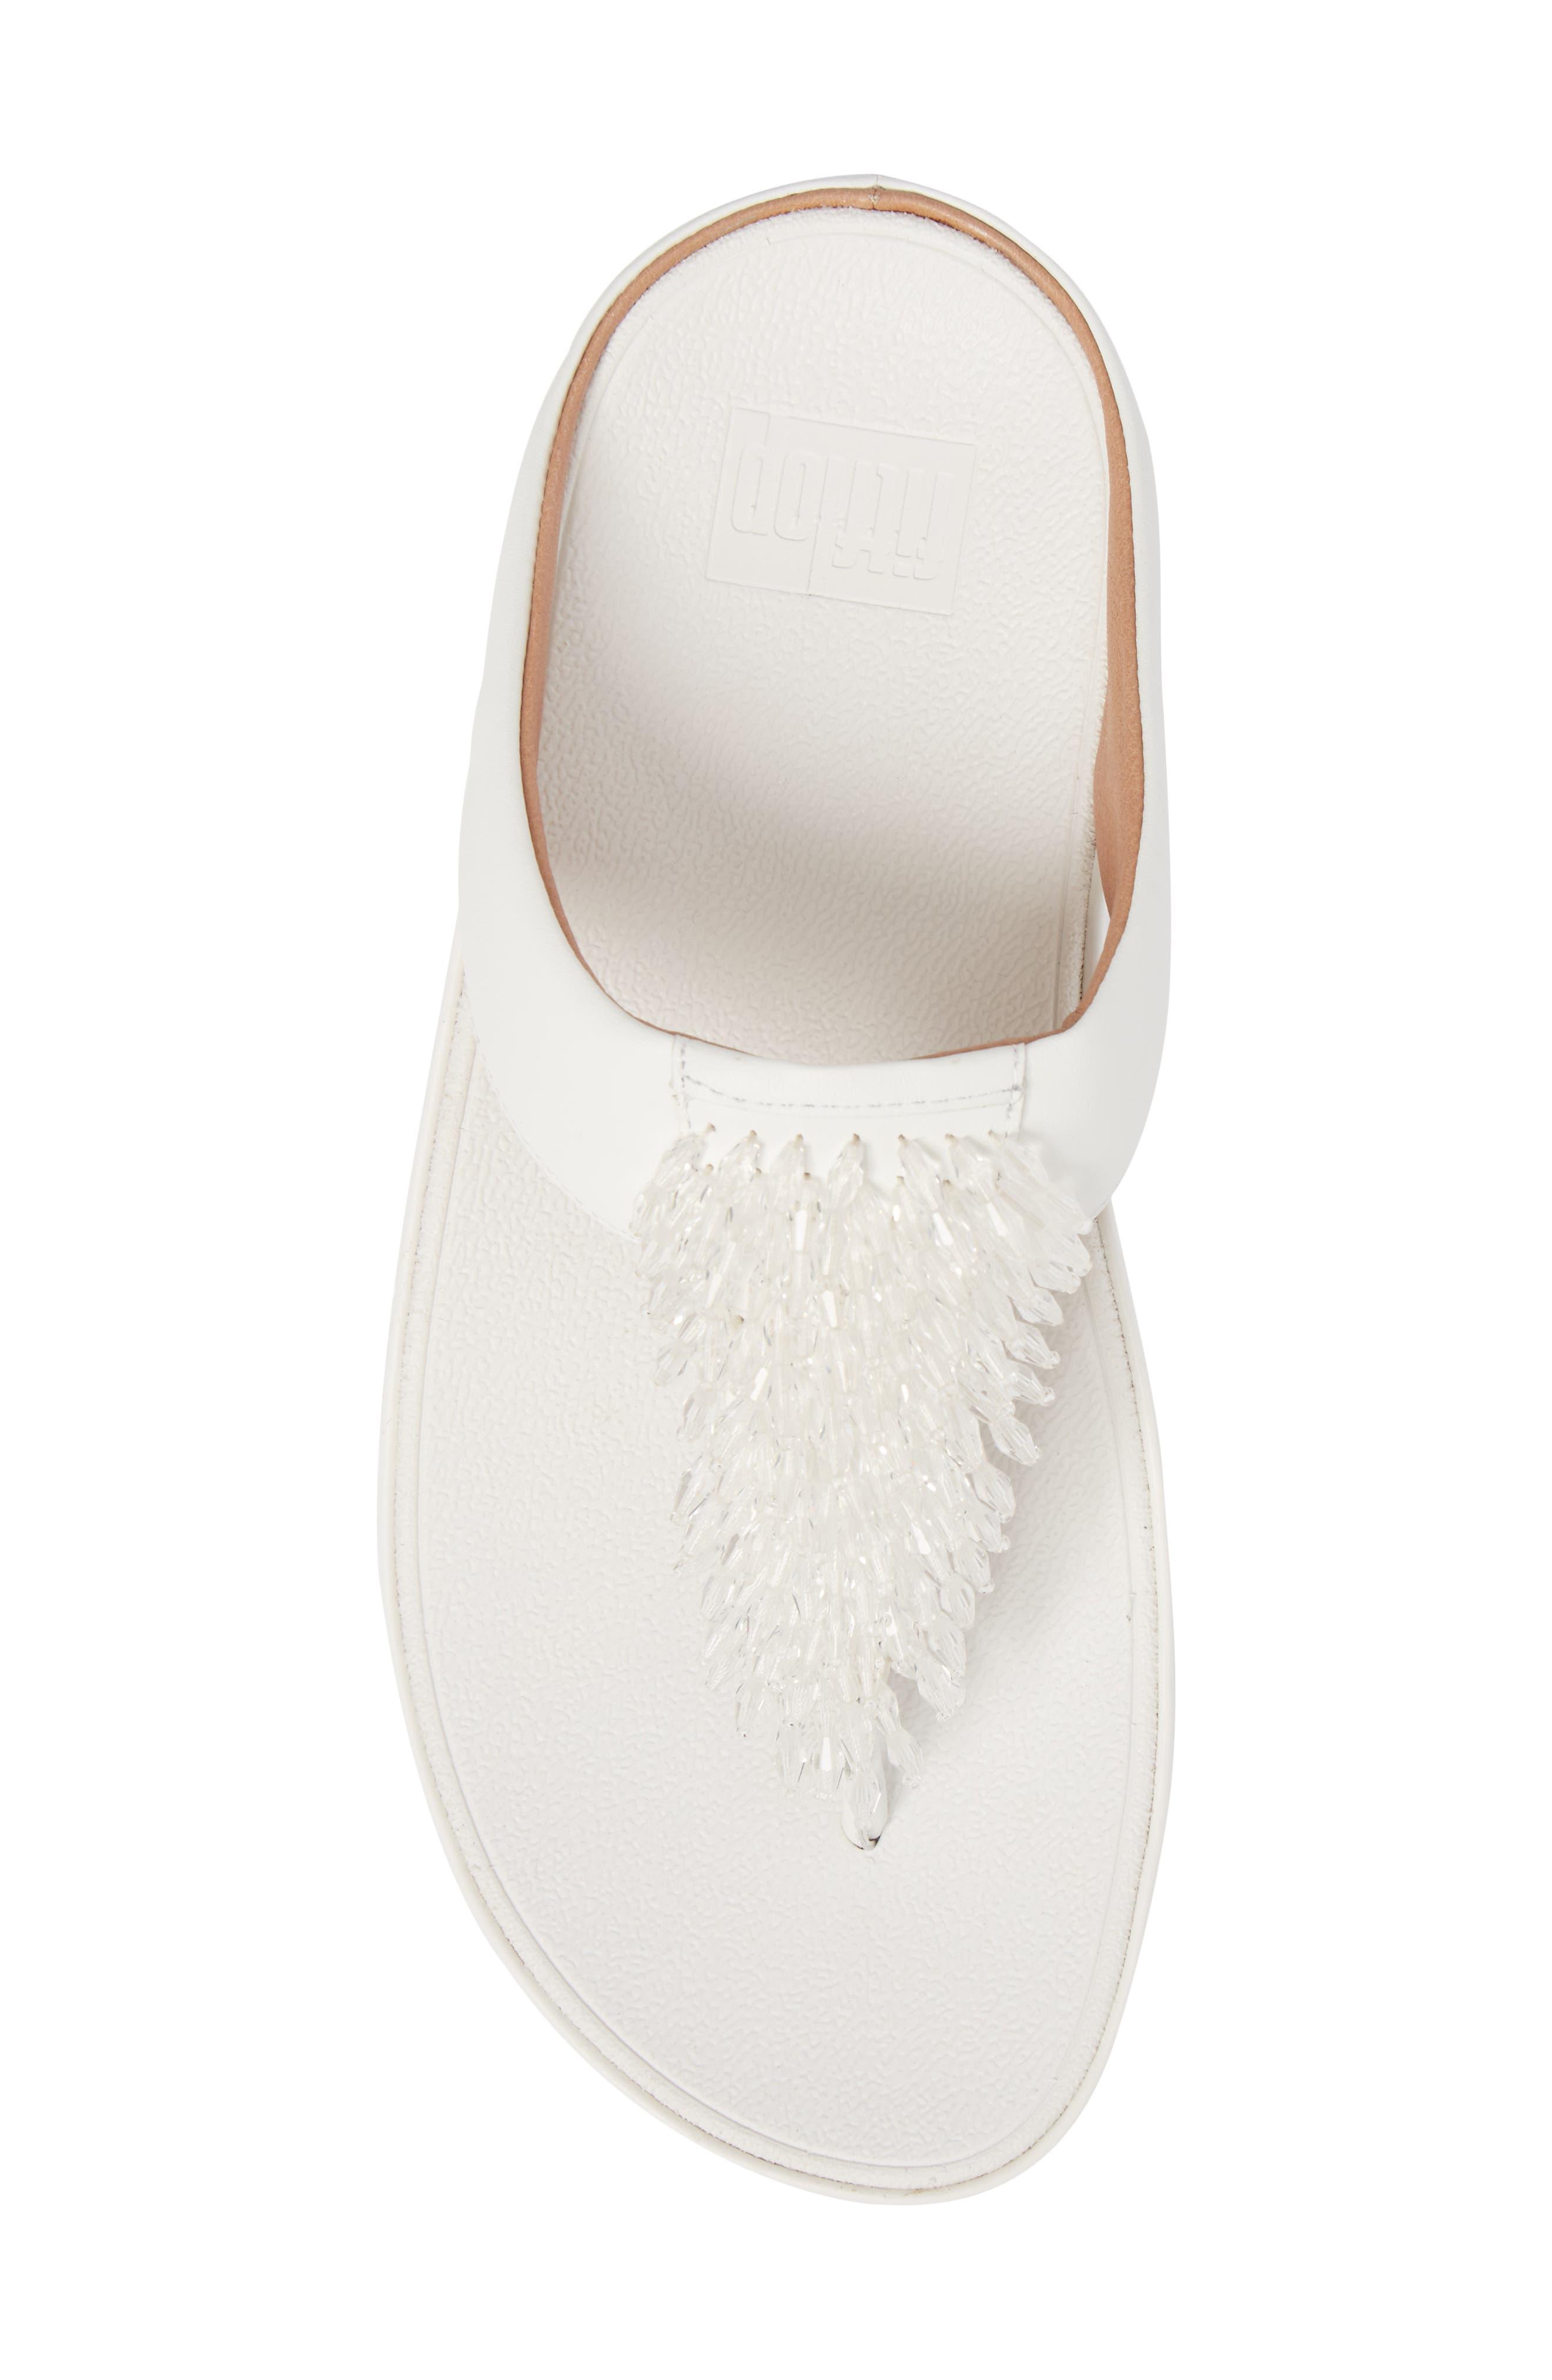 Rumba Sandal,                             Alternate thumbnail 5, color,                             Urban White Leather